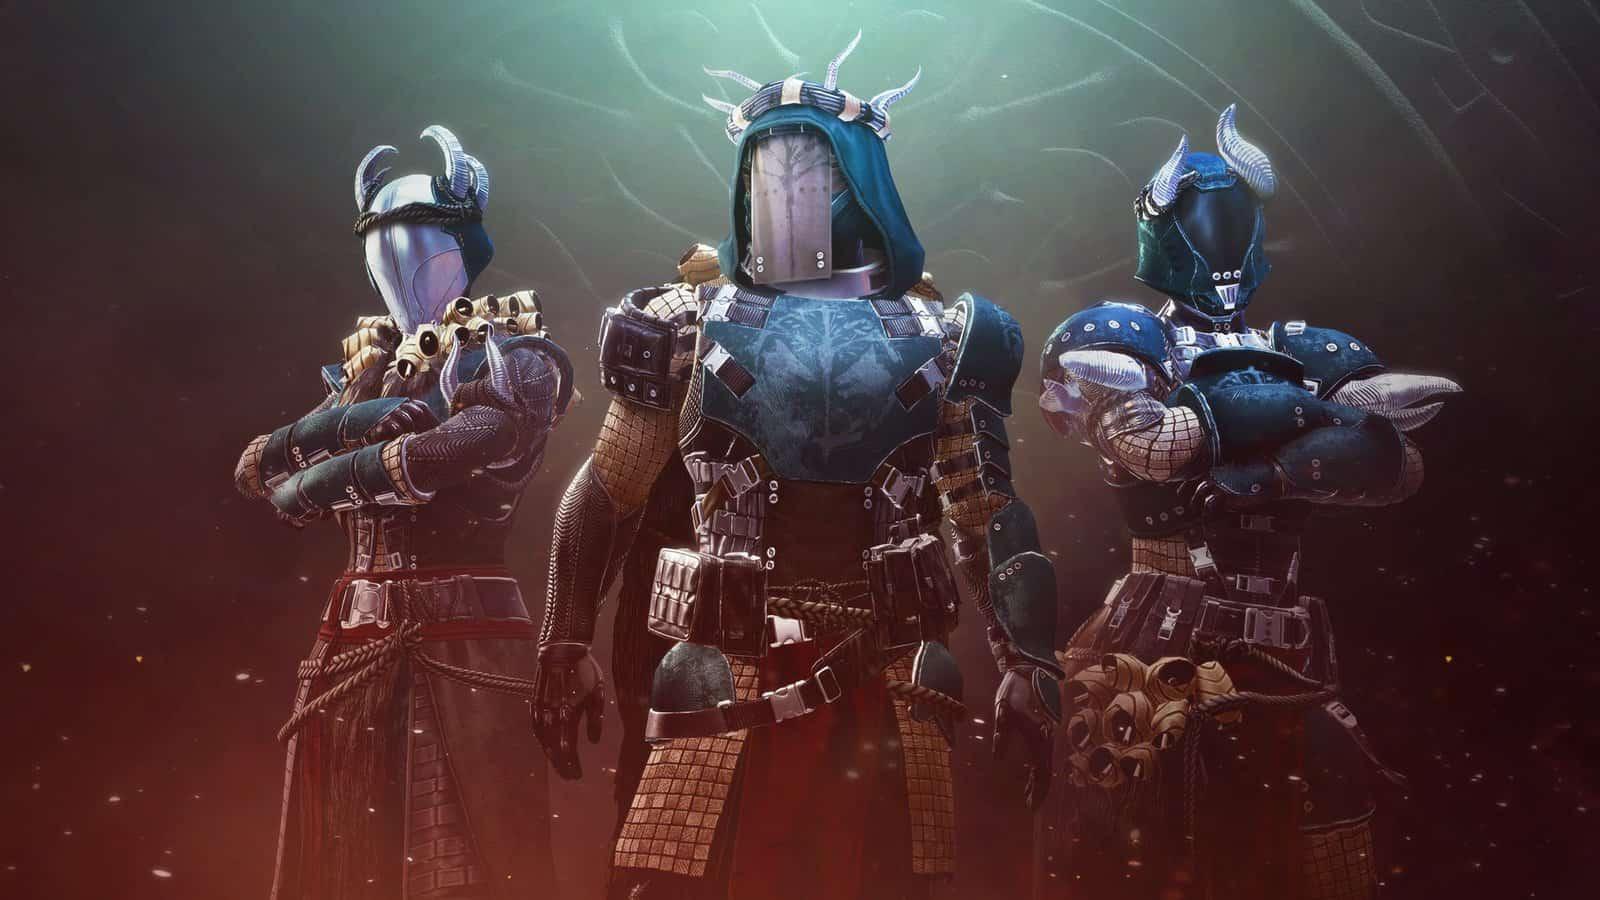 Iron Banner Armor Season 15 Destiny 2 1080p